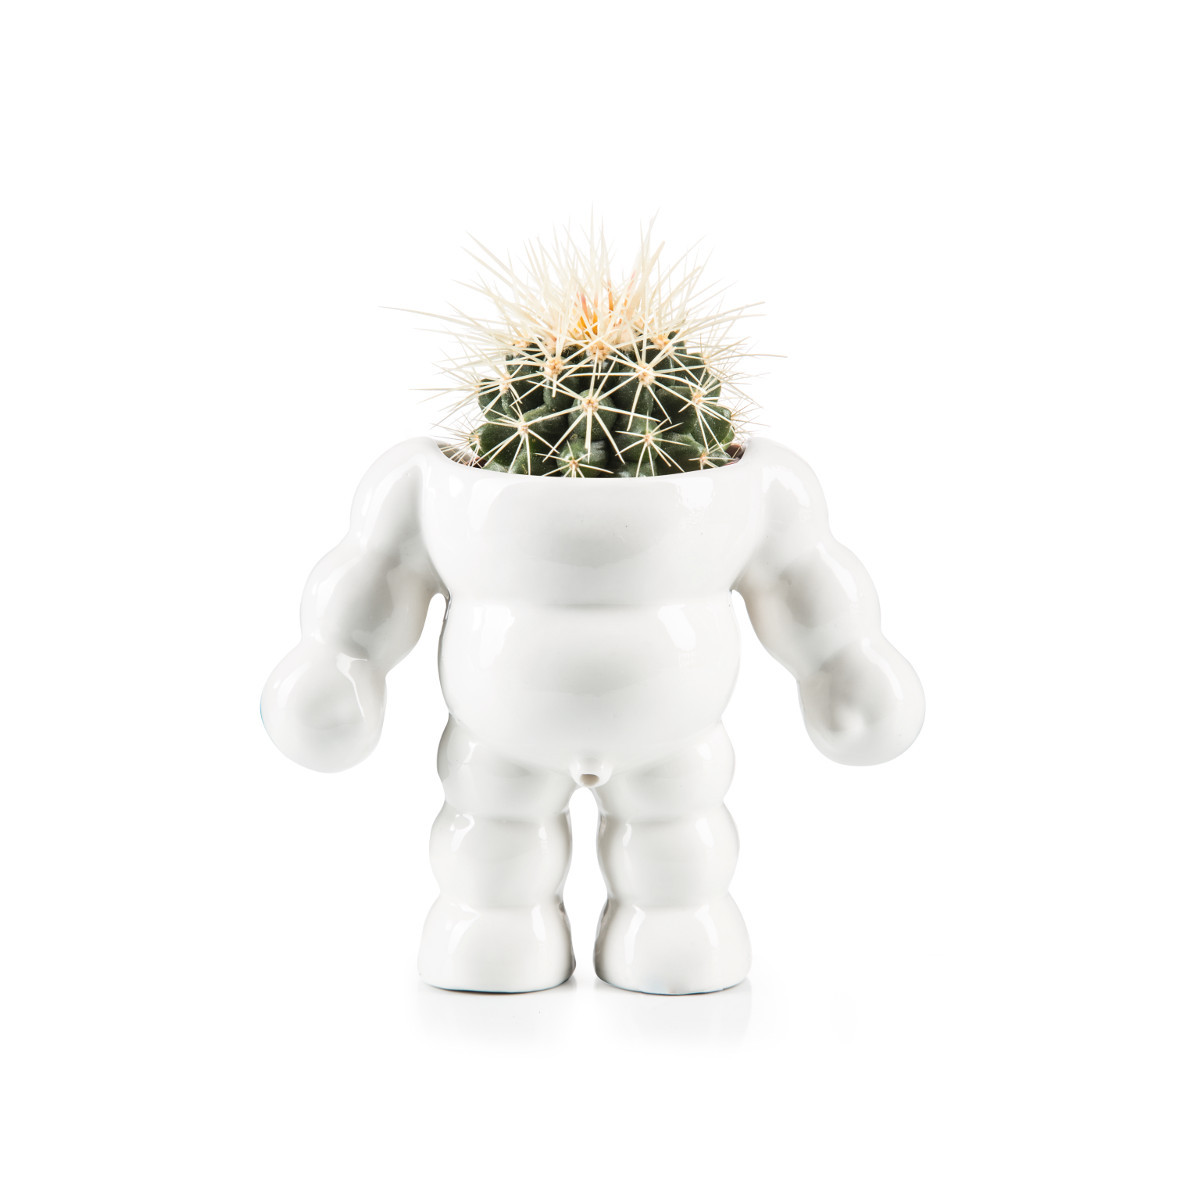 Blumentopf Dickerchen